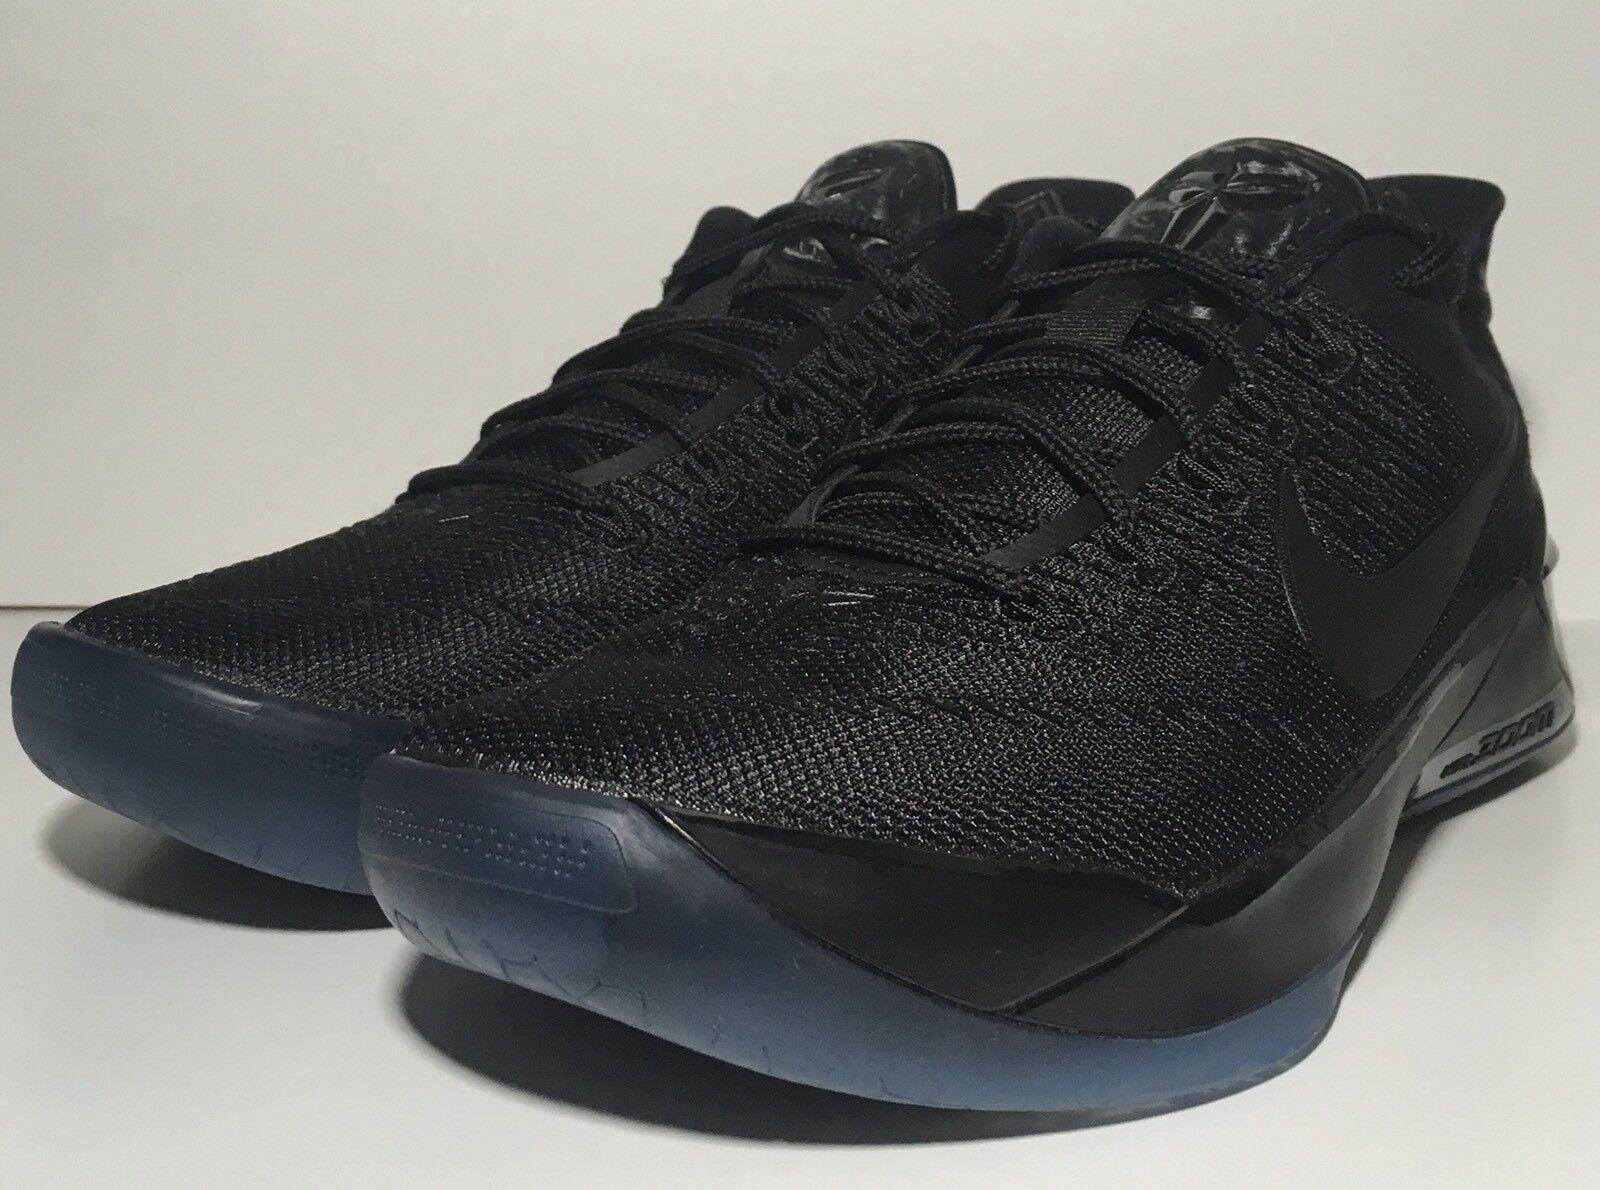 "ad351a7cbd SZ.8 Nike Kobe A.D. 852425-064 ""Black Mamba"" TripleBlack TripleBlack  TripleBlack"